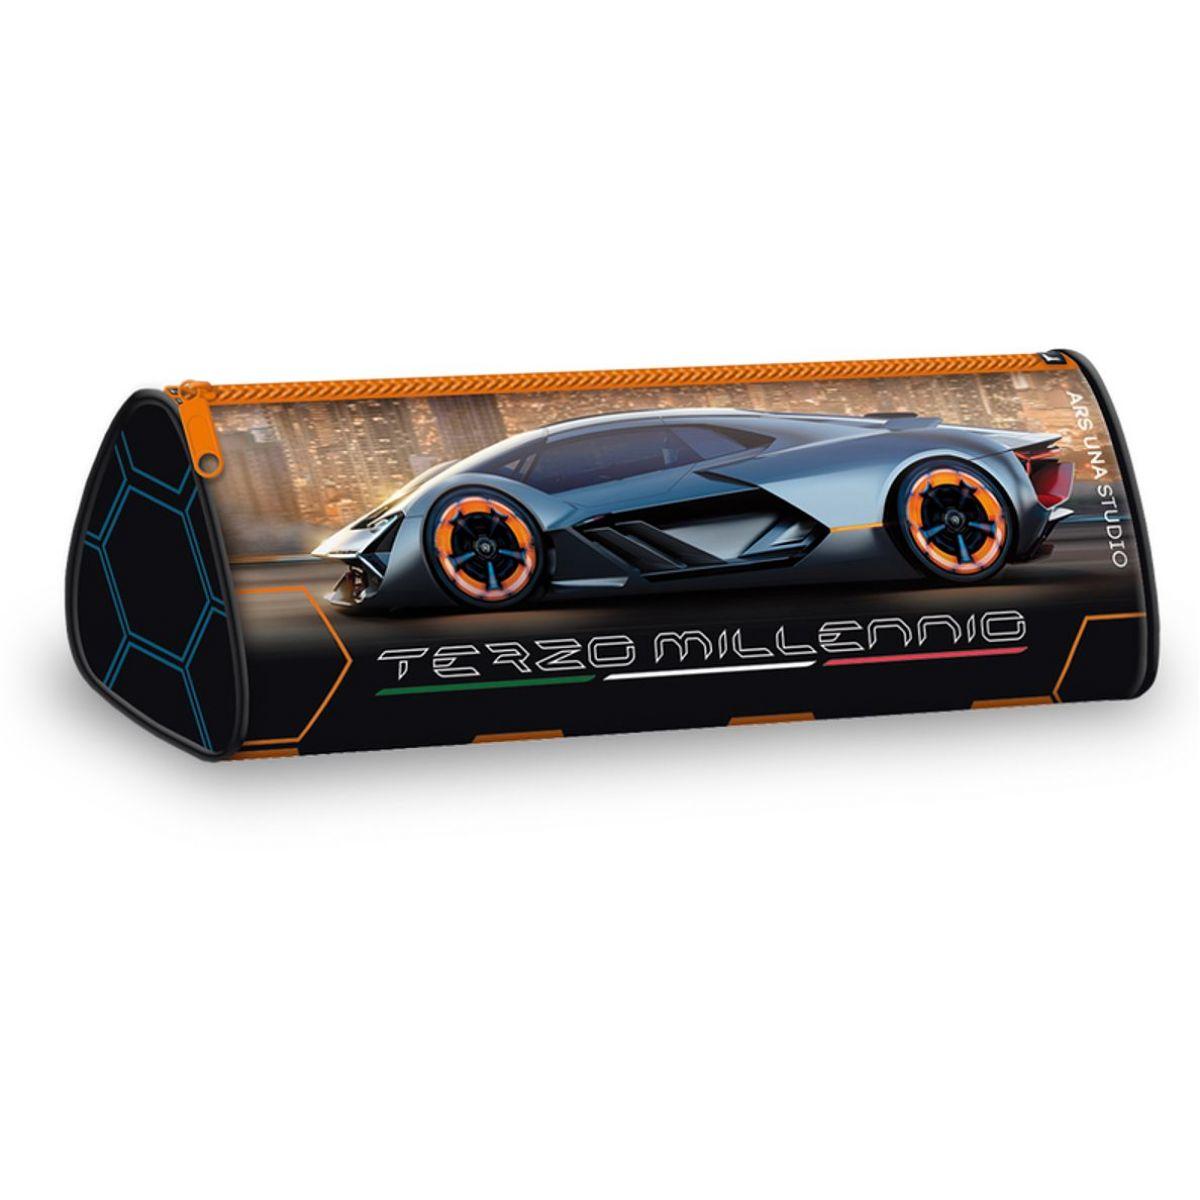 Ars Una Peračník Lamborghini 19 úzky